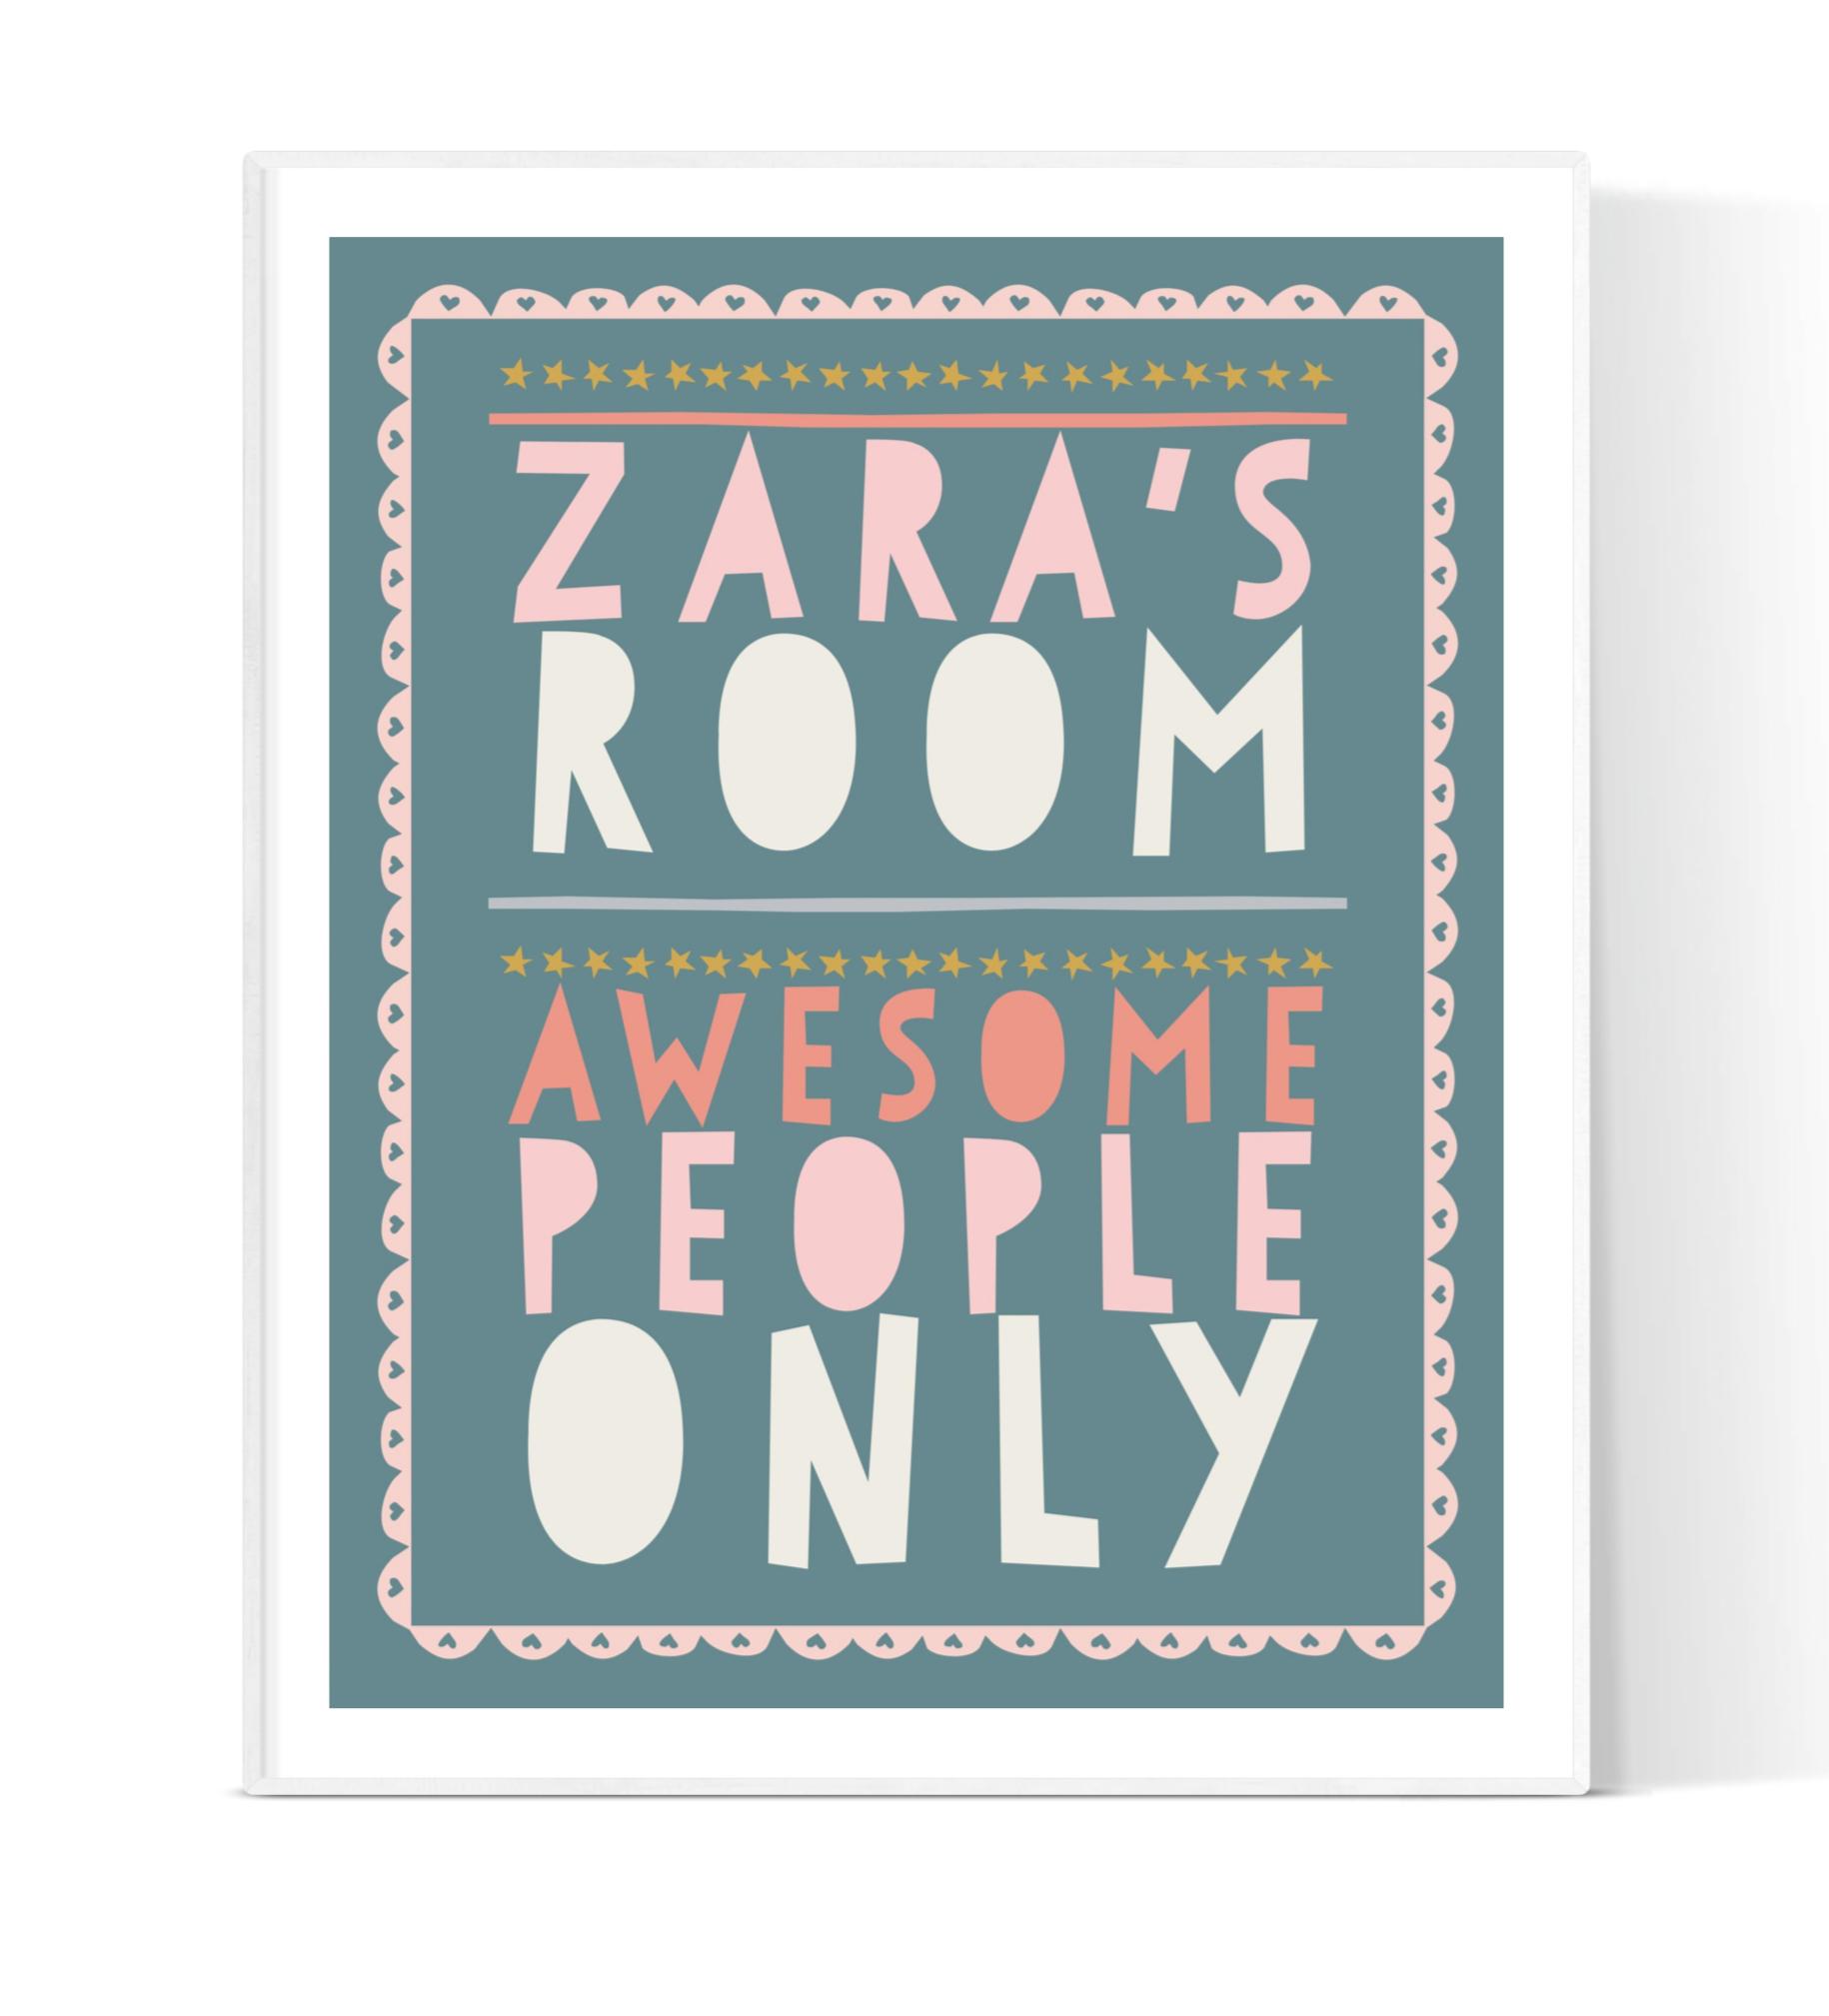 Zaras-room.jpg